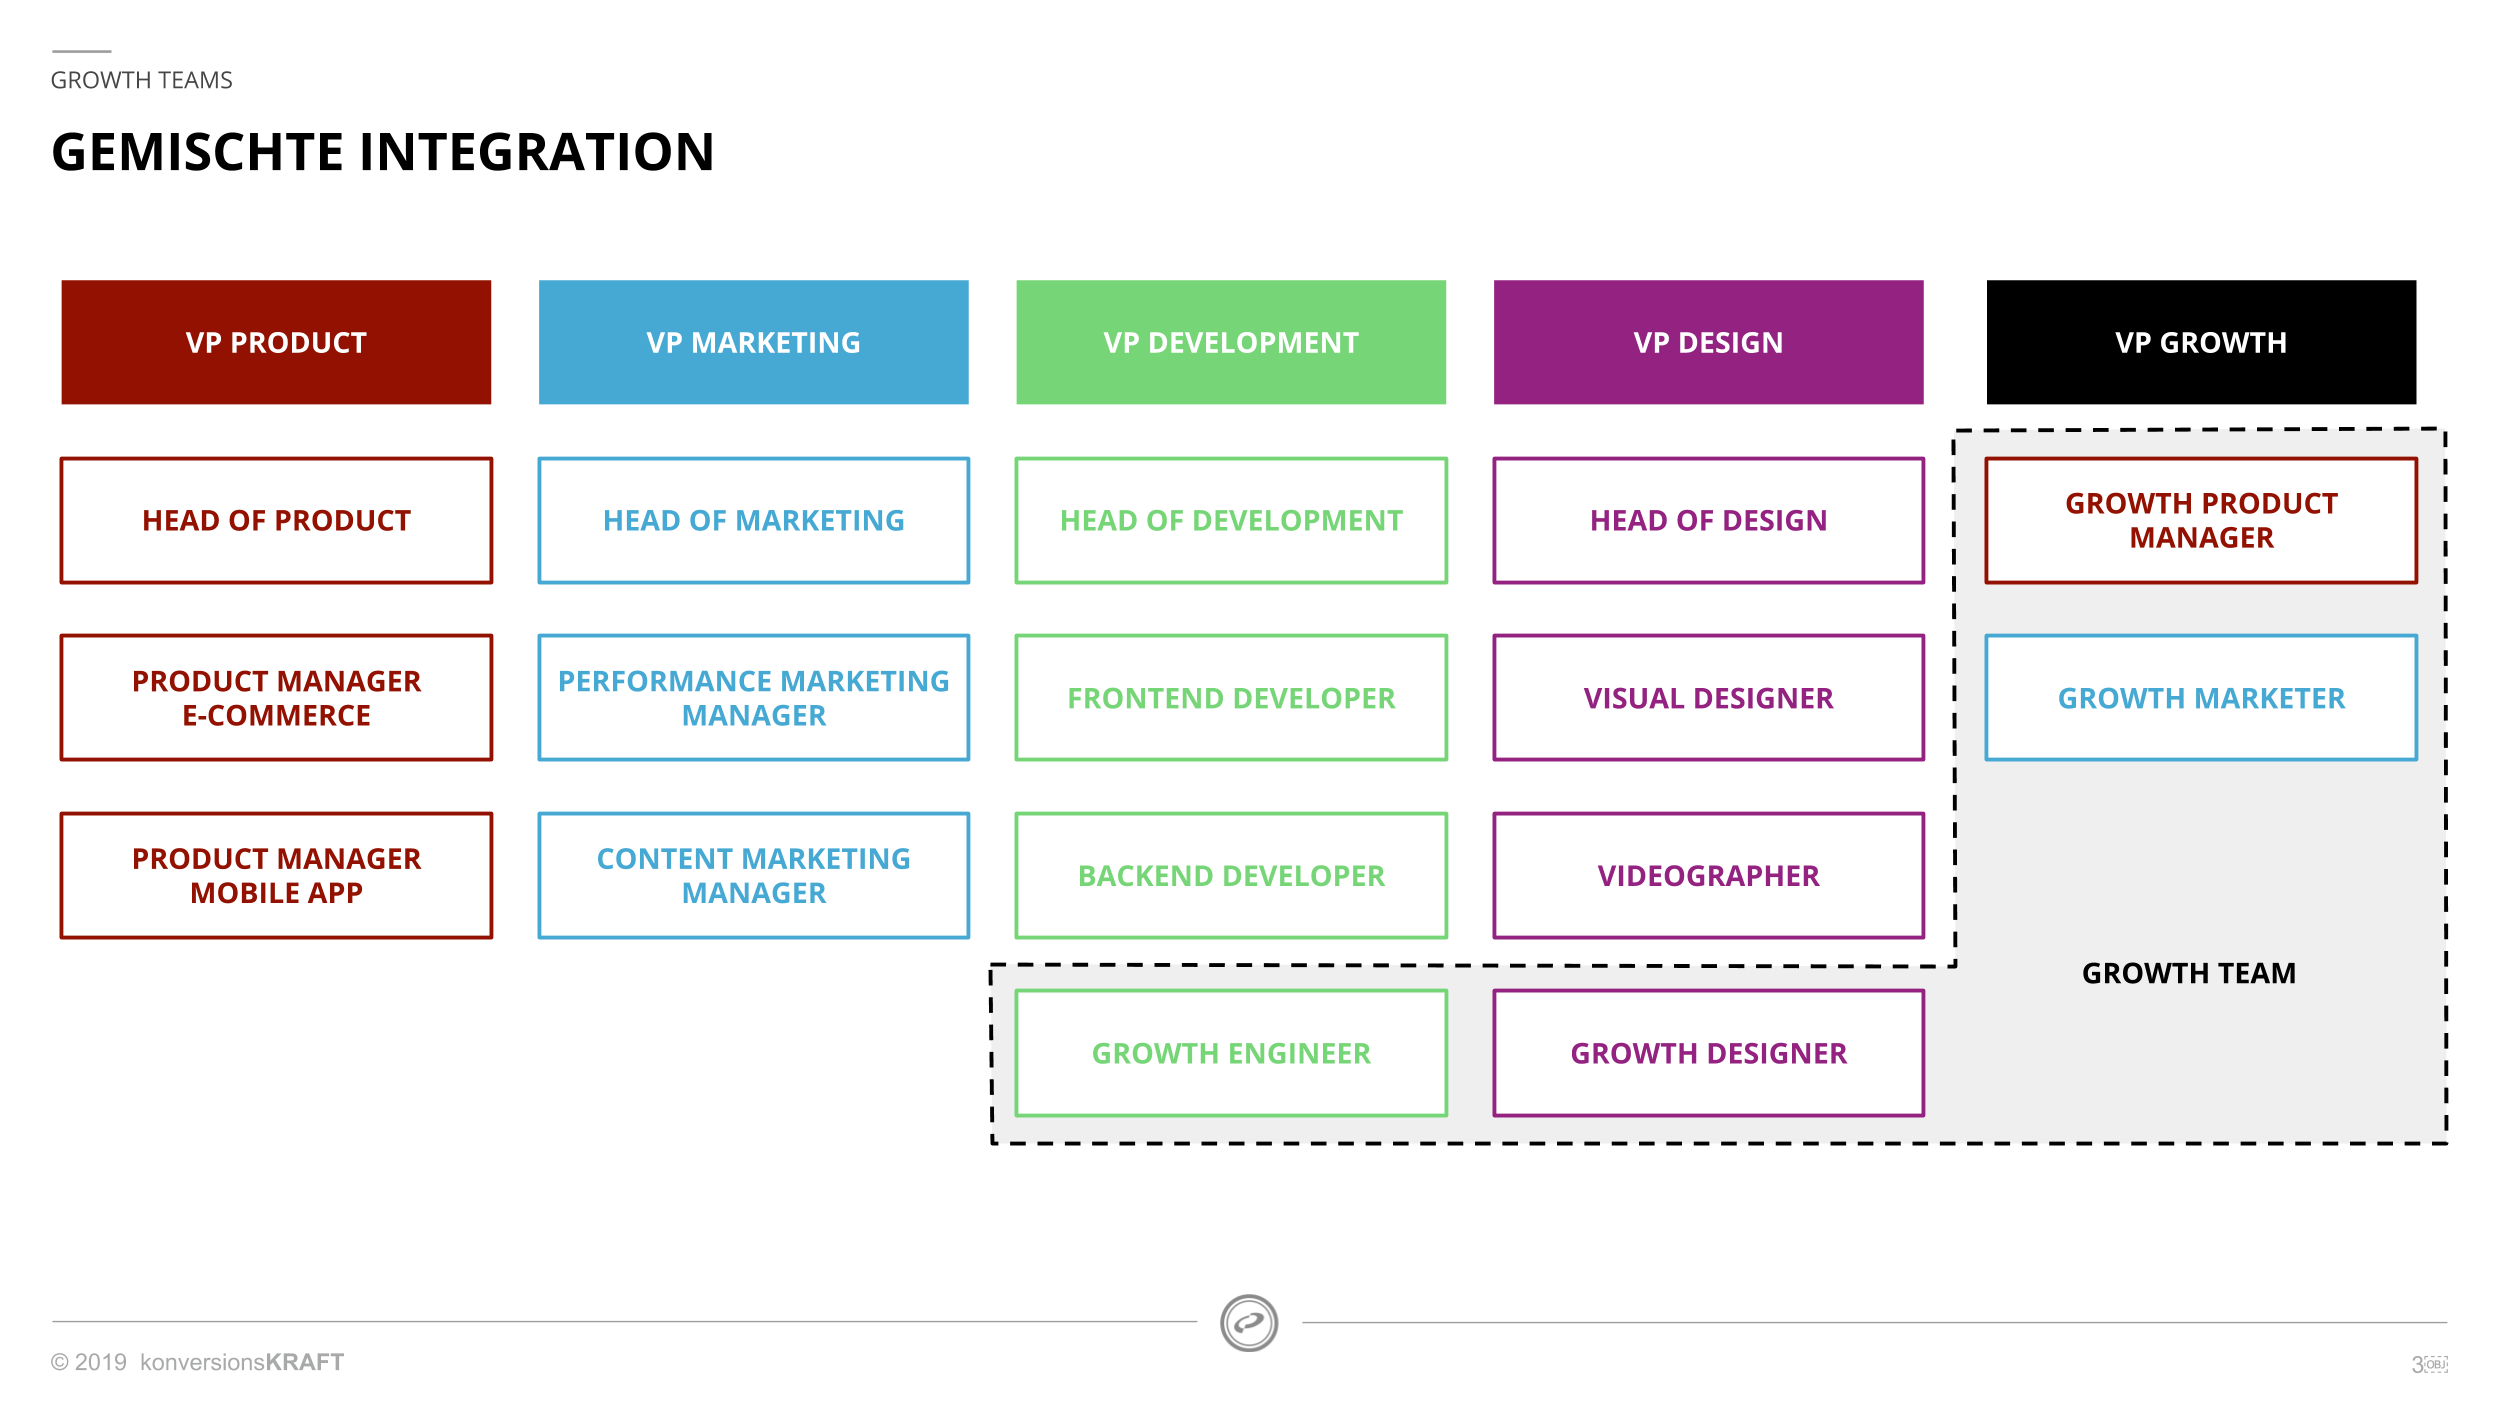 Growth Teams: Gemischte Integration